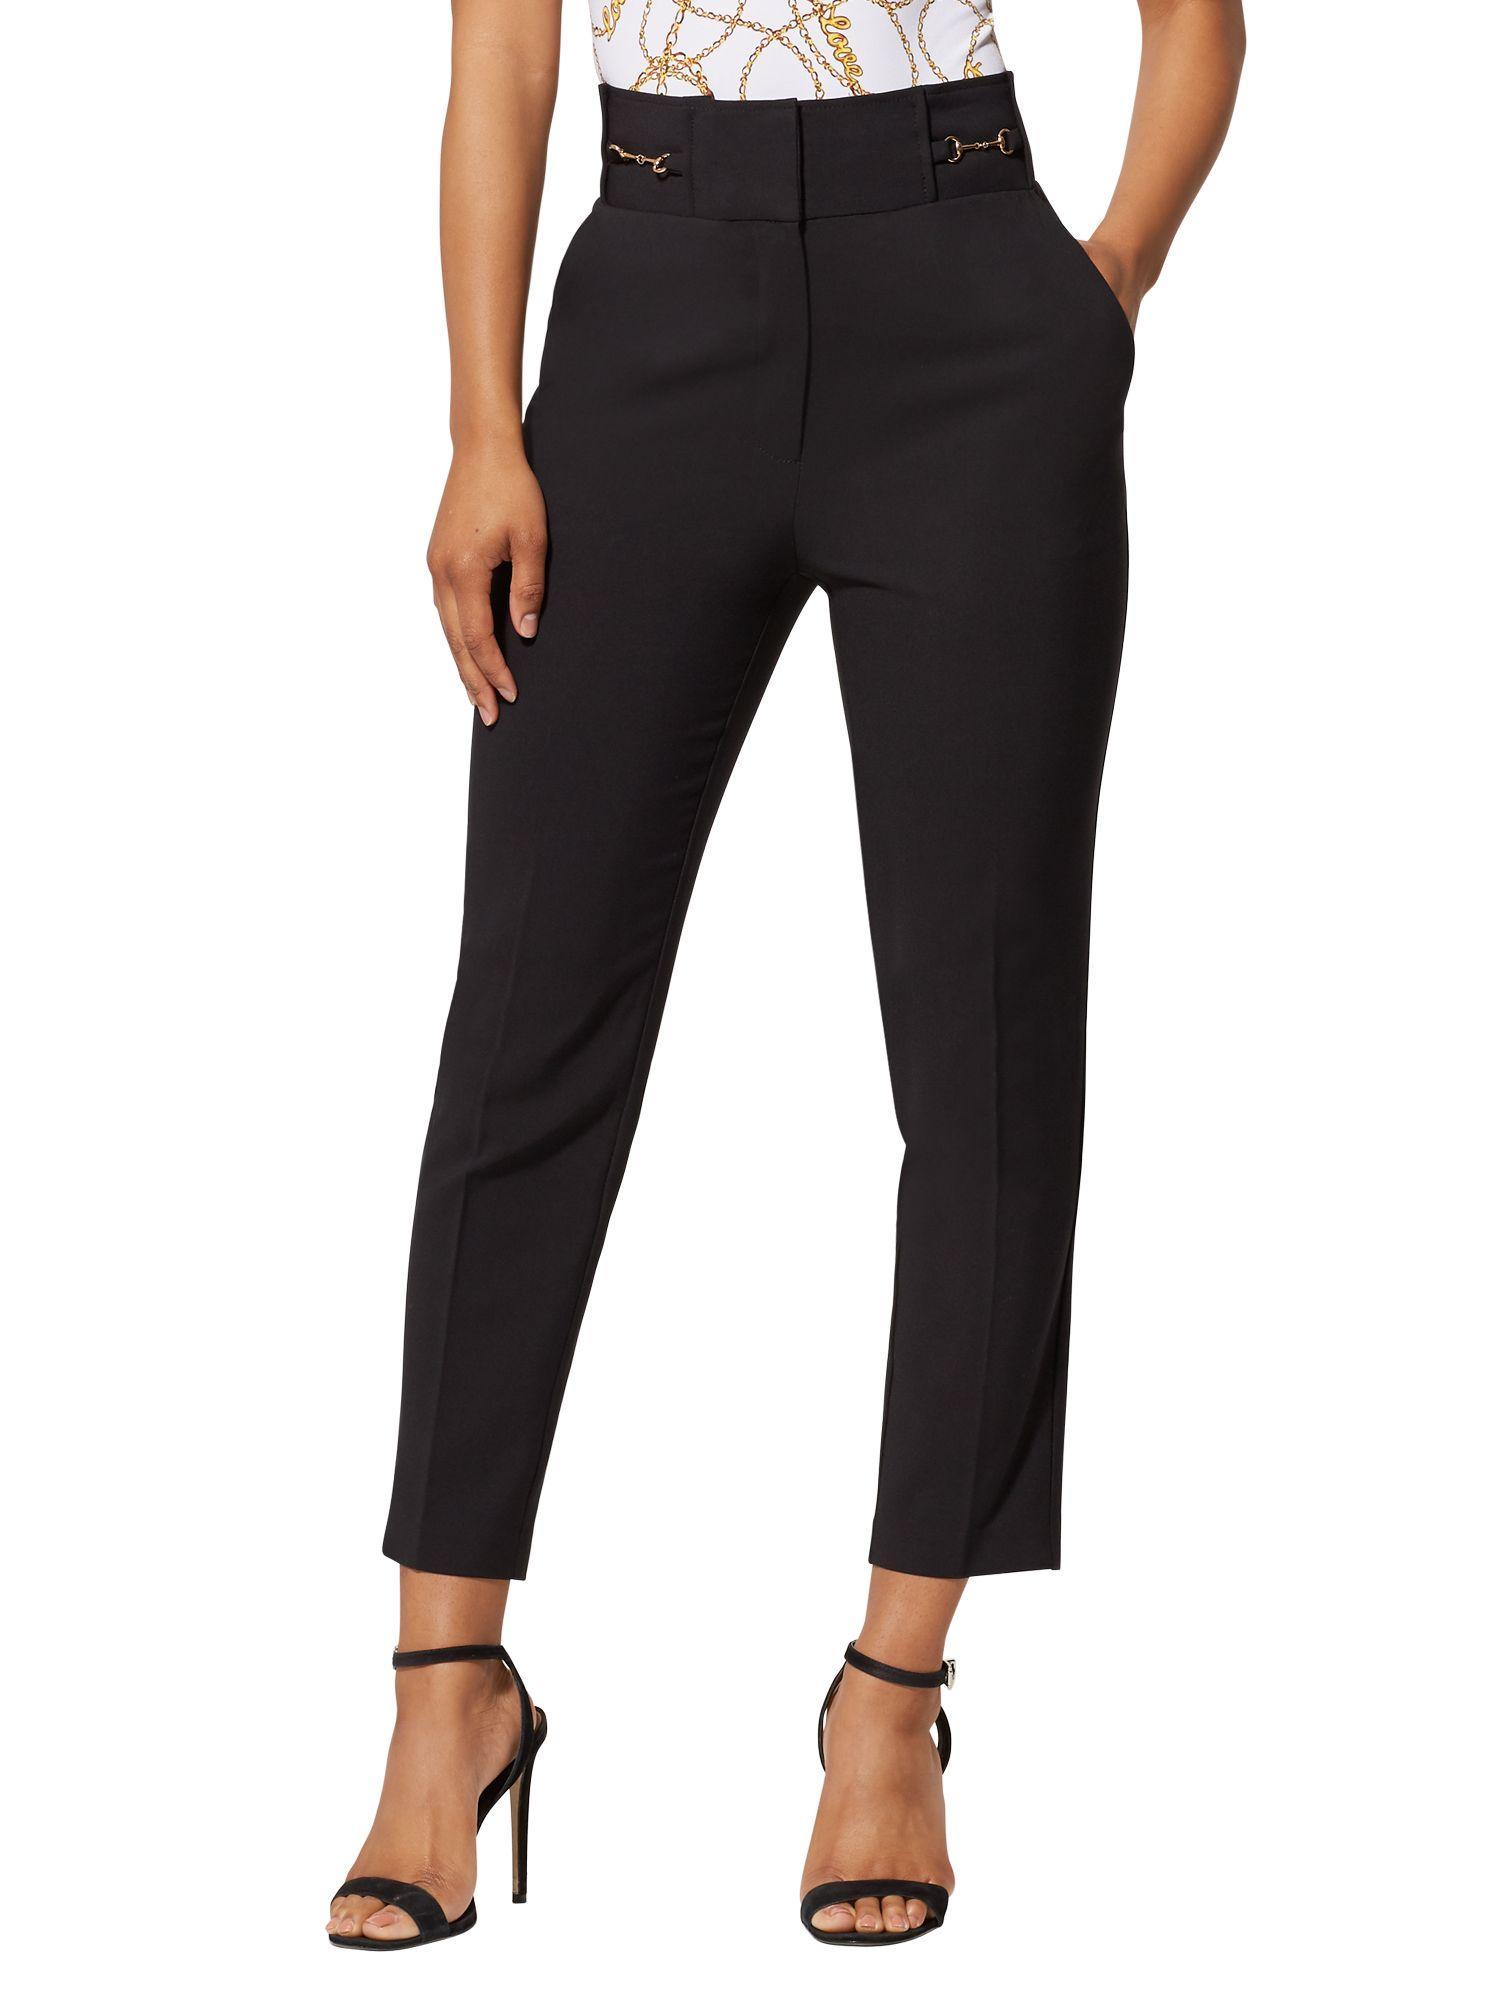 7df02e8b4c1fb7 New York & Company. Women's Black Hardware-accent Ankle Pant - All-season  Stretch - 7th Avenue